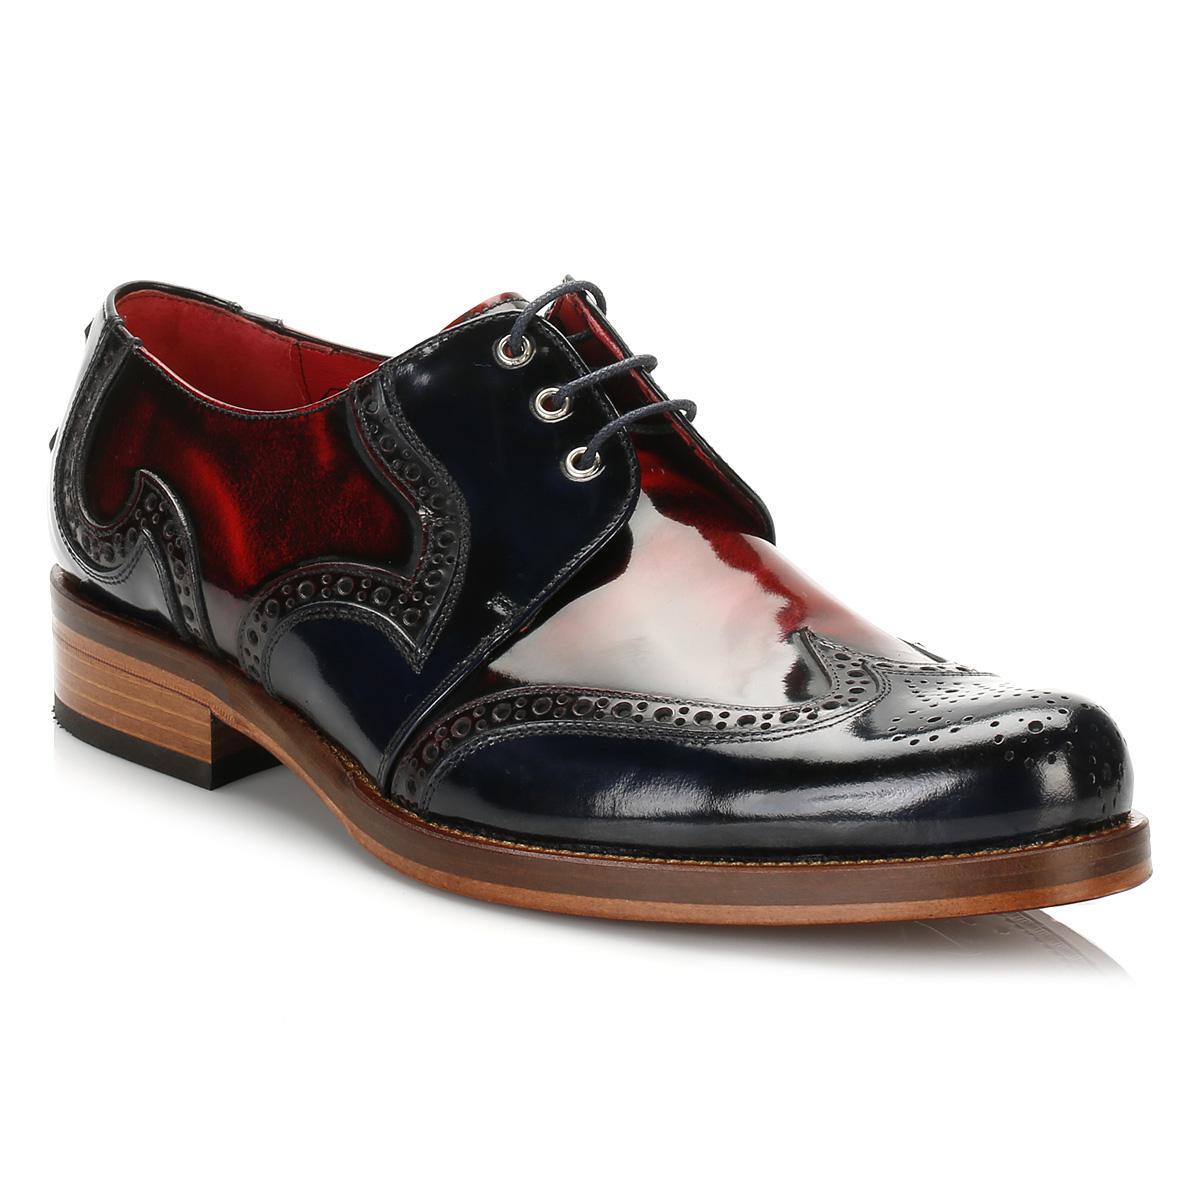 Jimmy Choo Shoes London Sale